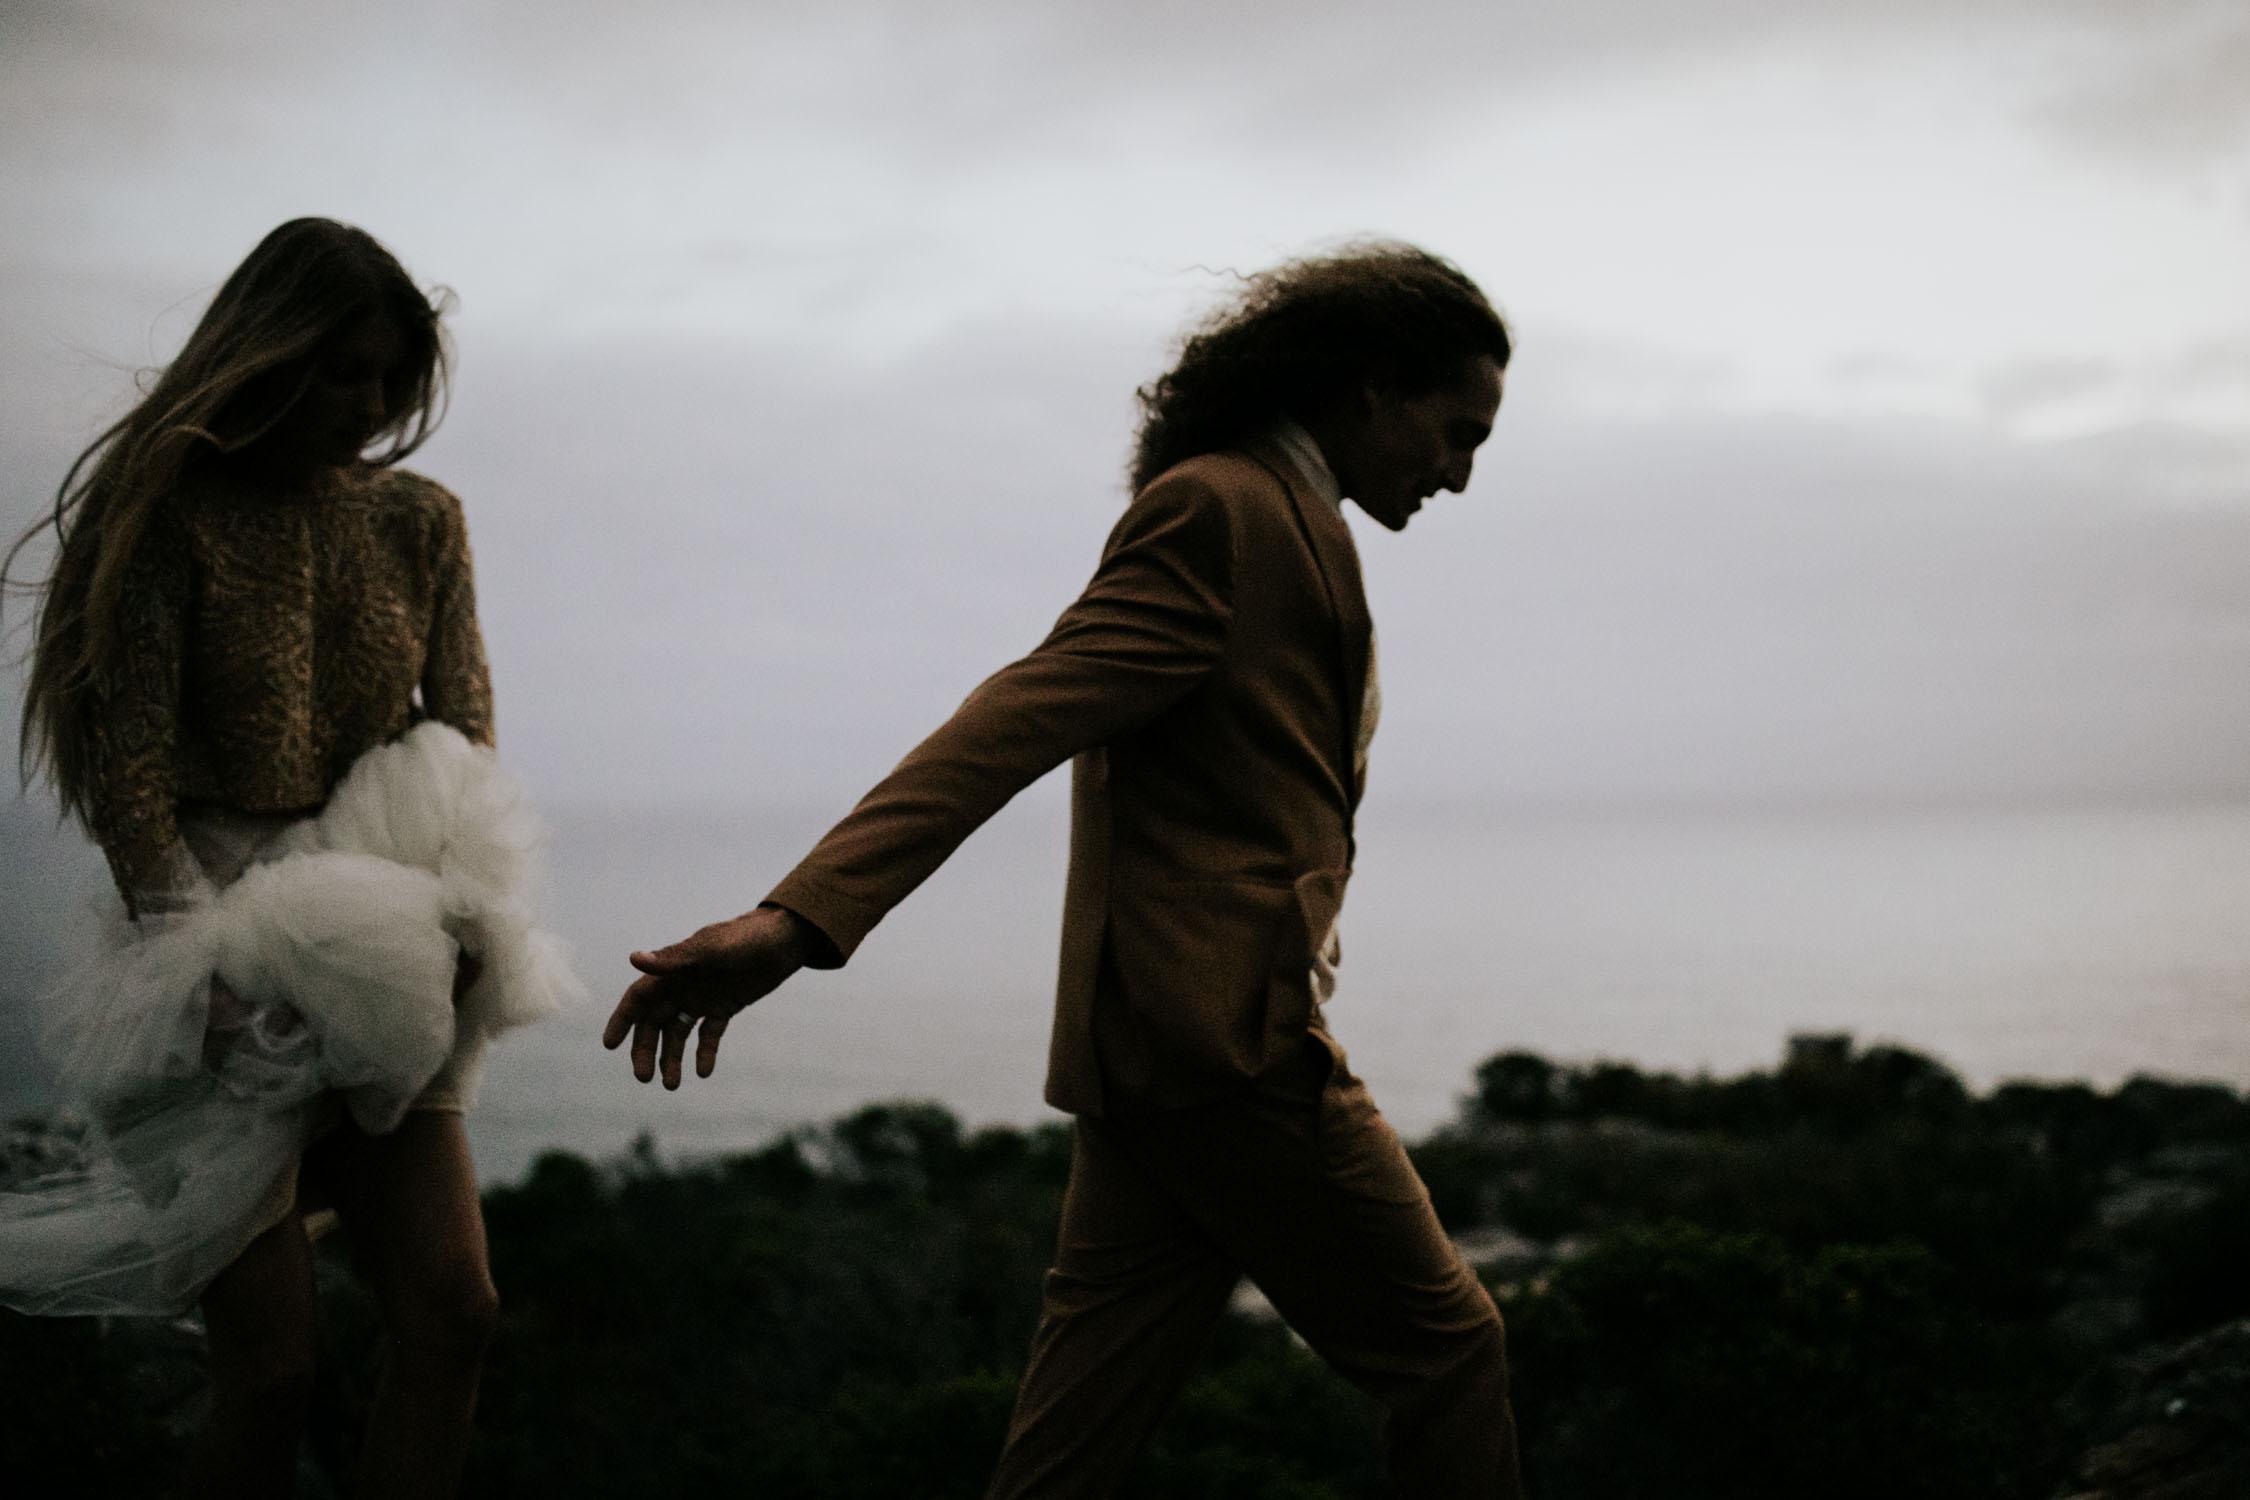 After dark navy hour dark and moody and emotive wedding photo